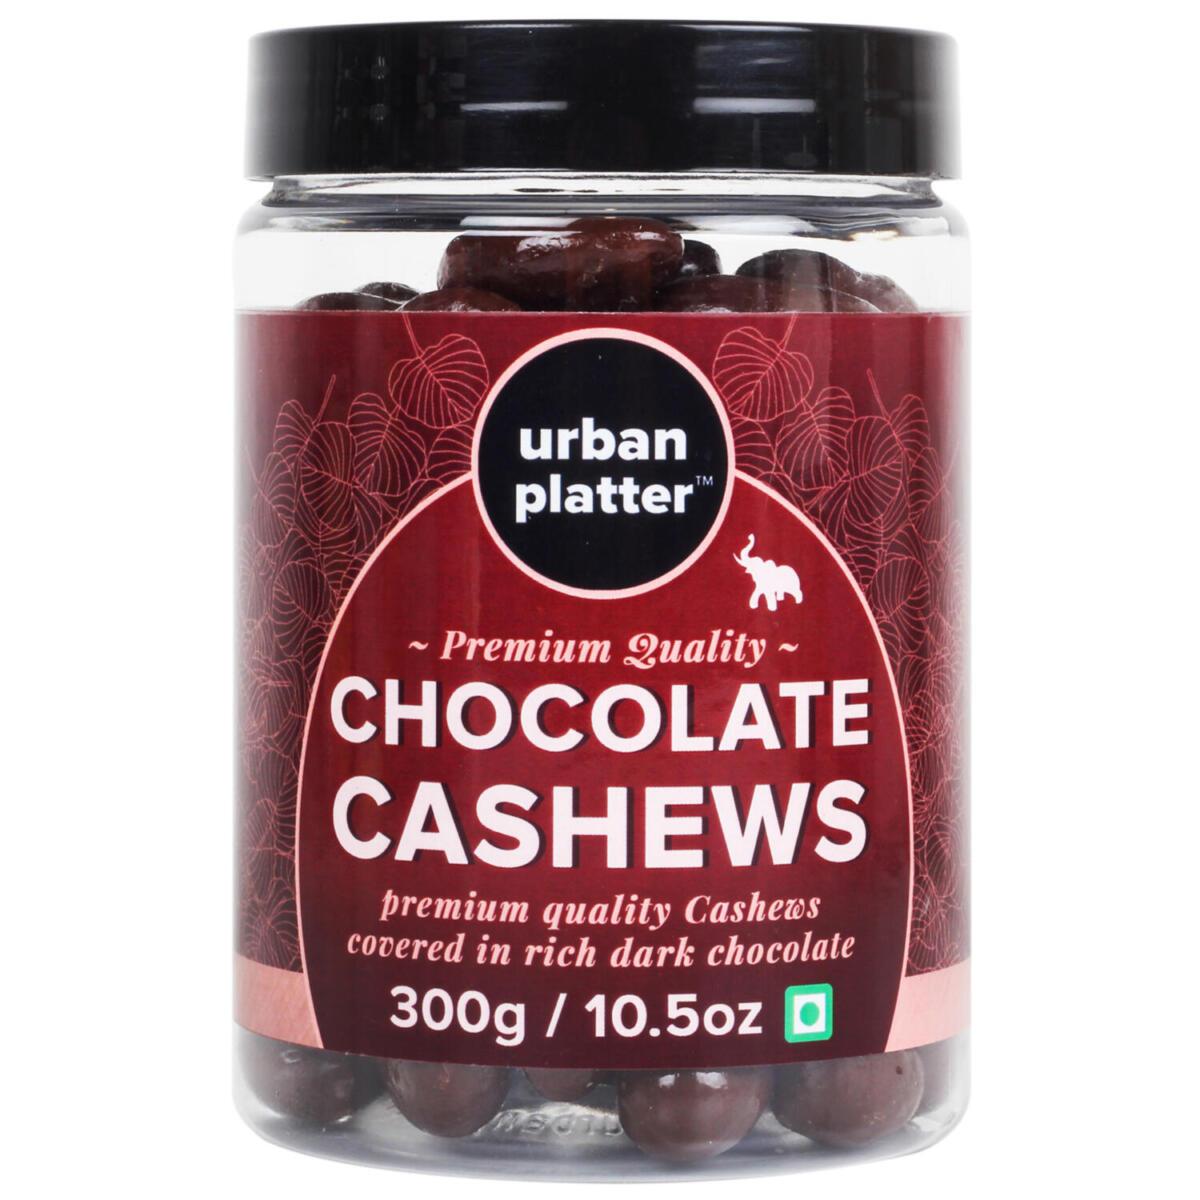 Urban Platter Chocolate Cashews (Kaju), 300g / 10.5oz [Cashews Covered in Dark Chocolate]